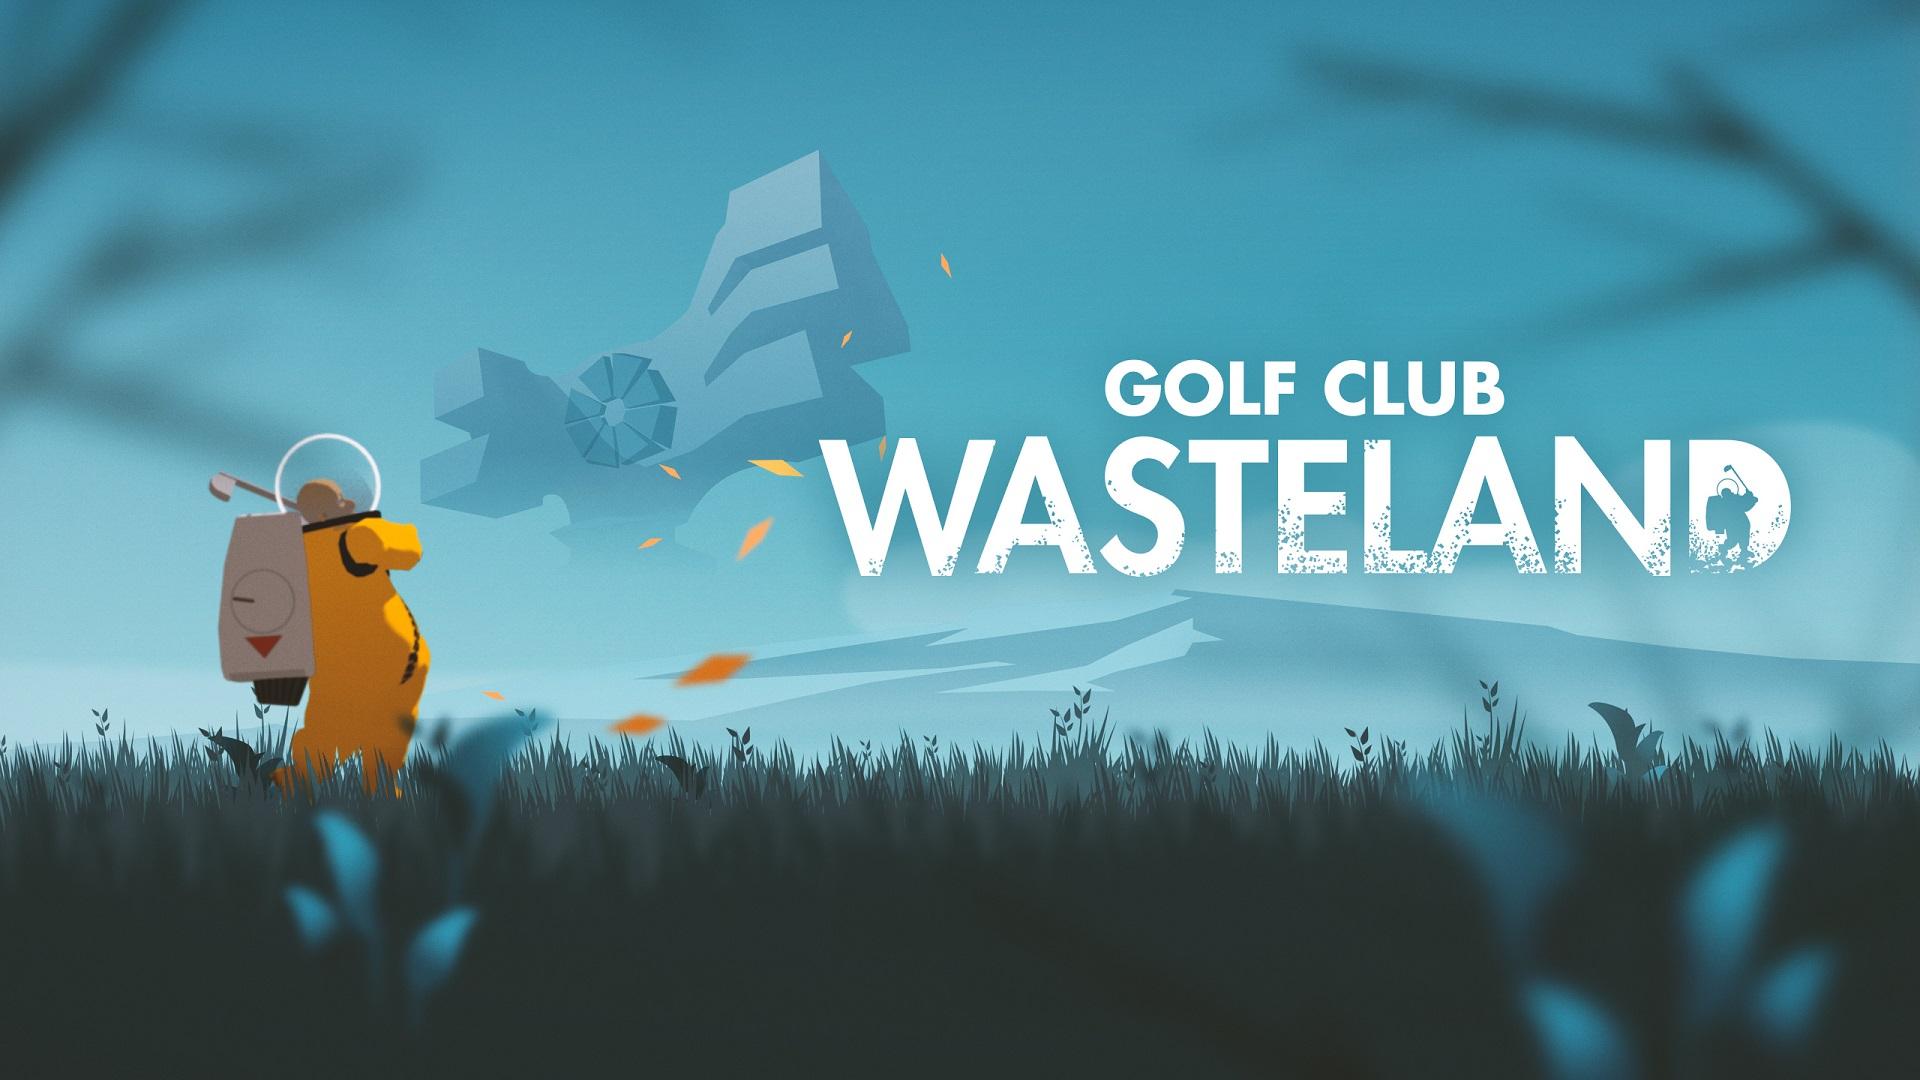 Golf Club Wasteland – Post-apokalyptický golf.